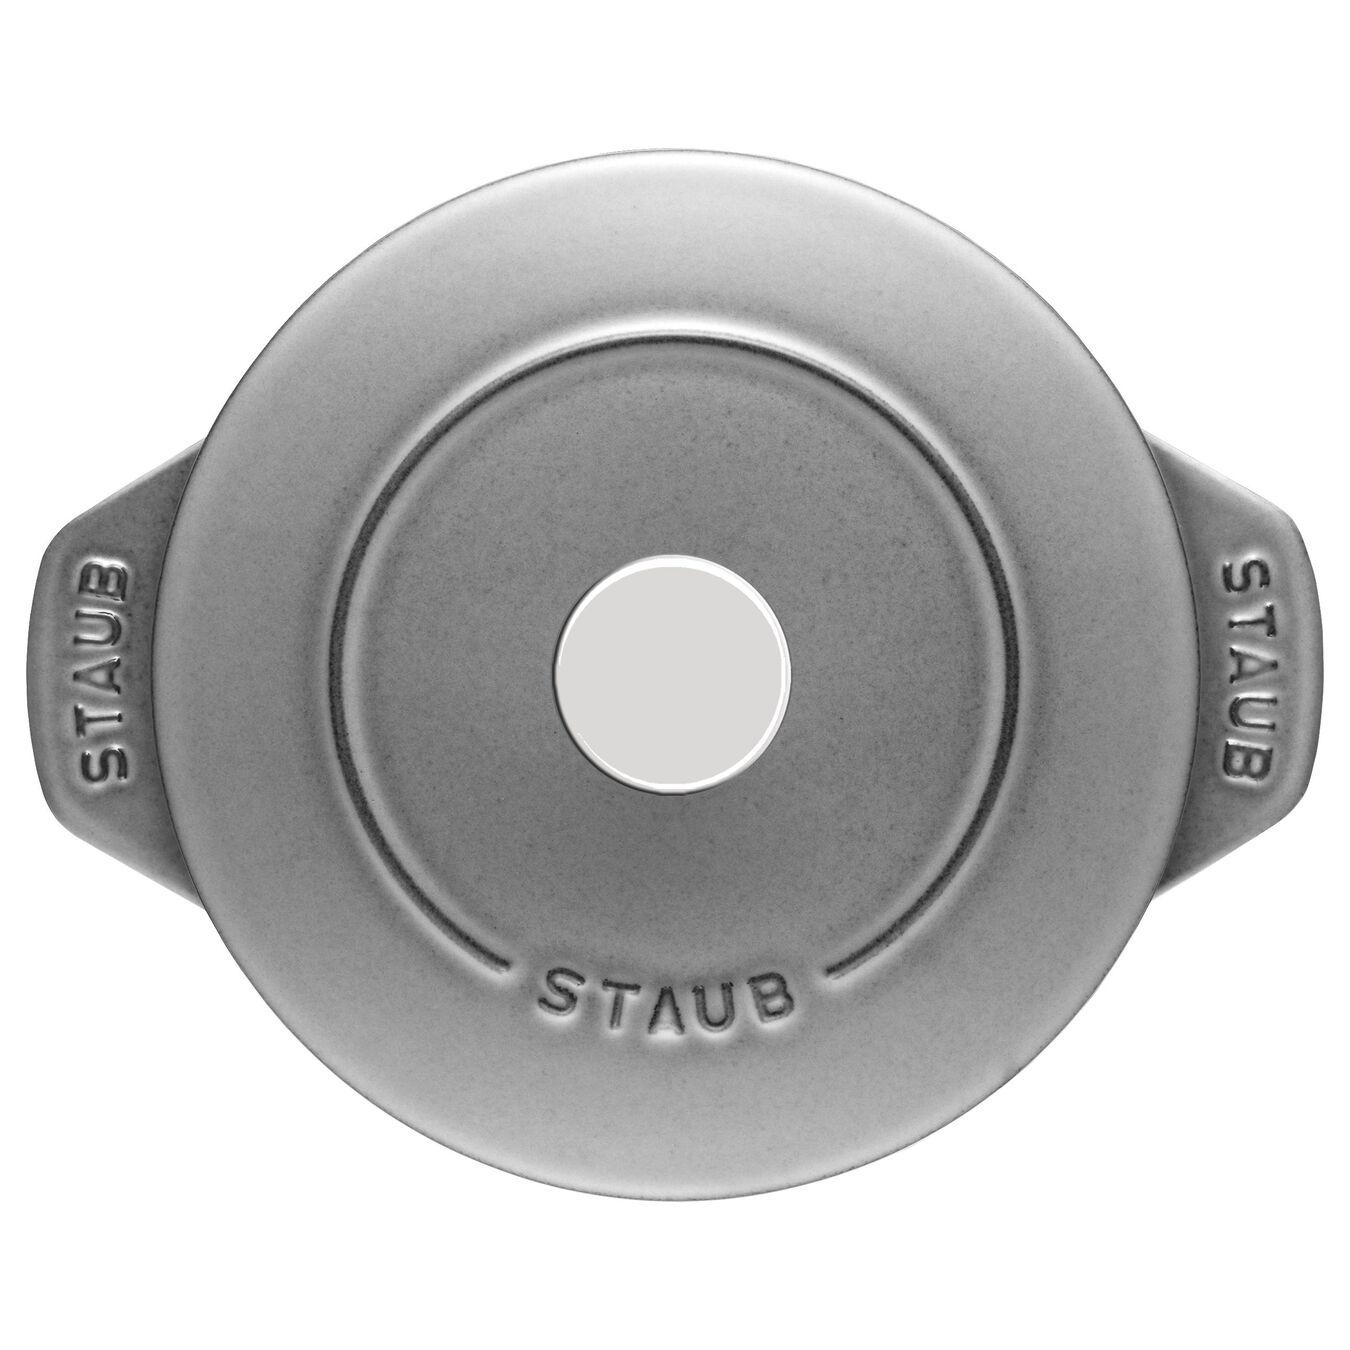 Reis-Cocotte 16 cm, rund, Graphit-Grau, Gusseisen,,large 2